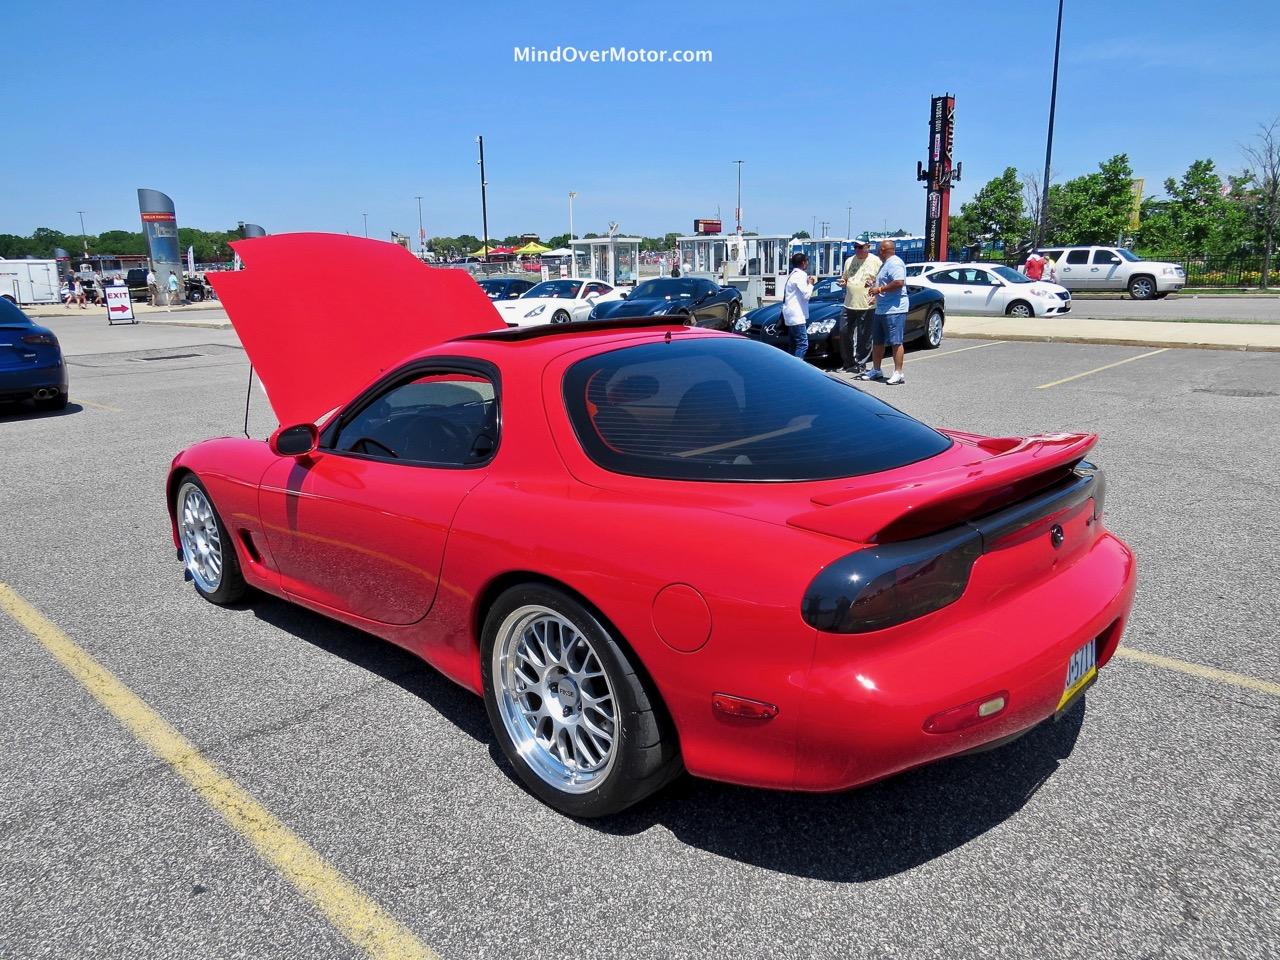 RX-7 Rear